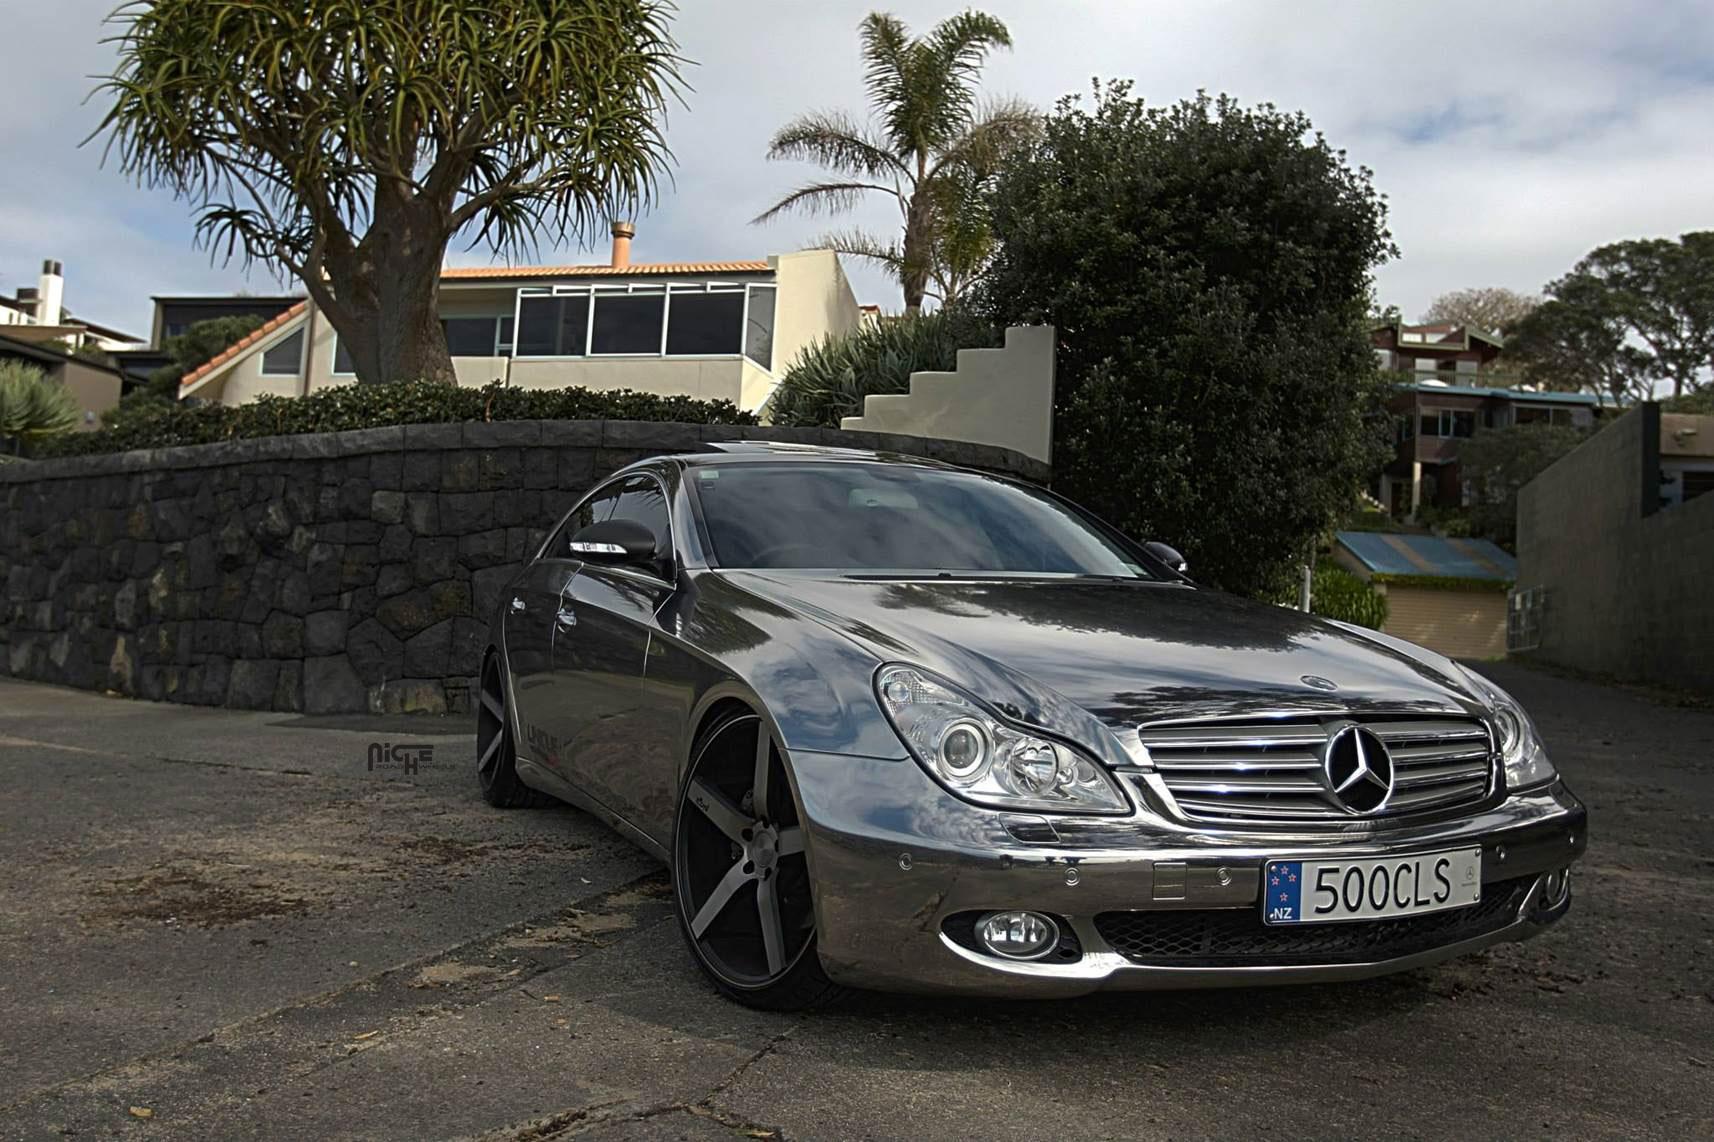 Mercedes benz cls500 milan m134 gallery mht wheels inc for Mercedes benz cls500